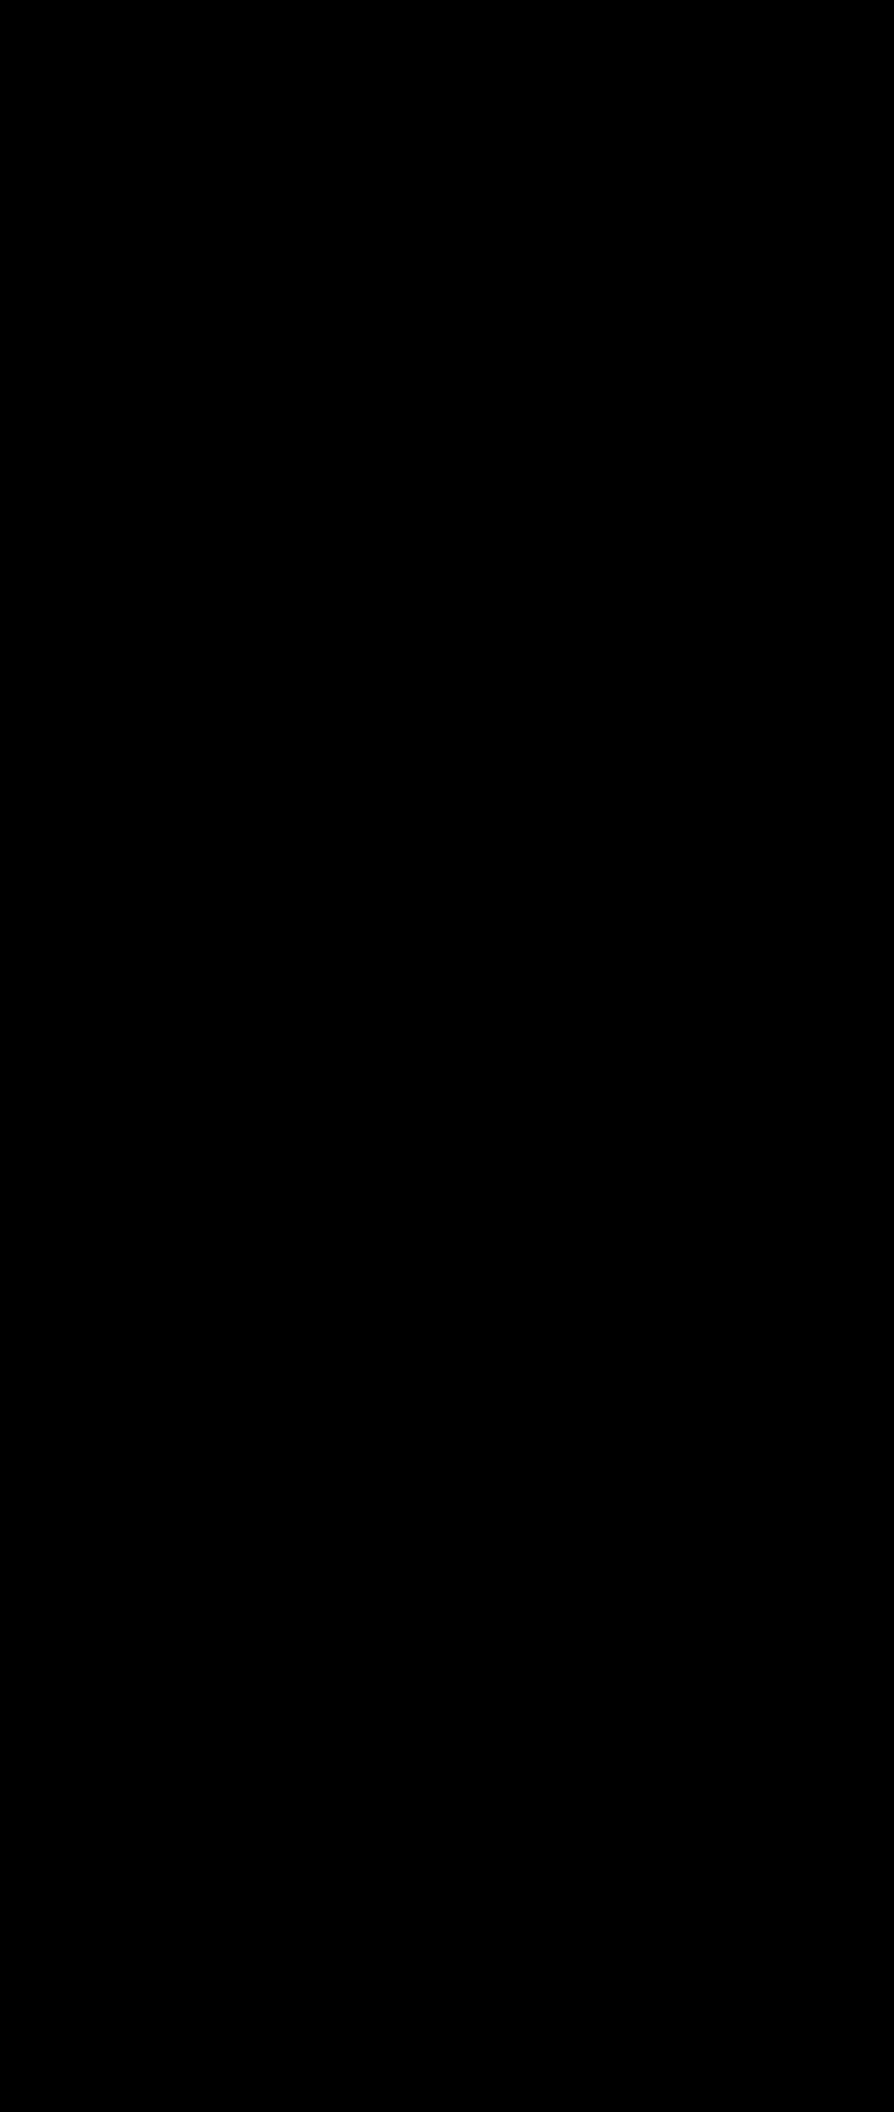 894x2112 Clipart